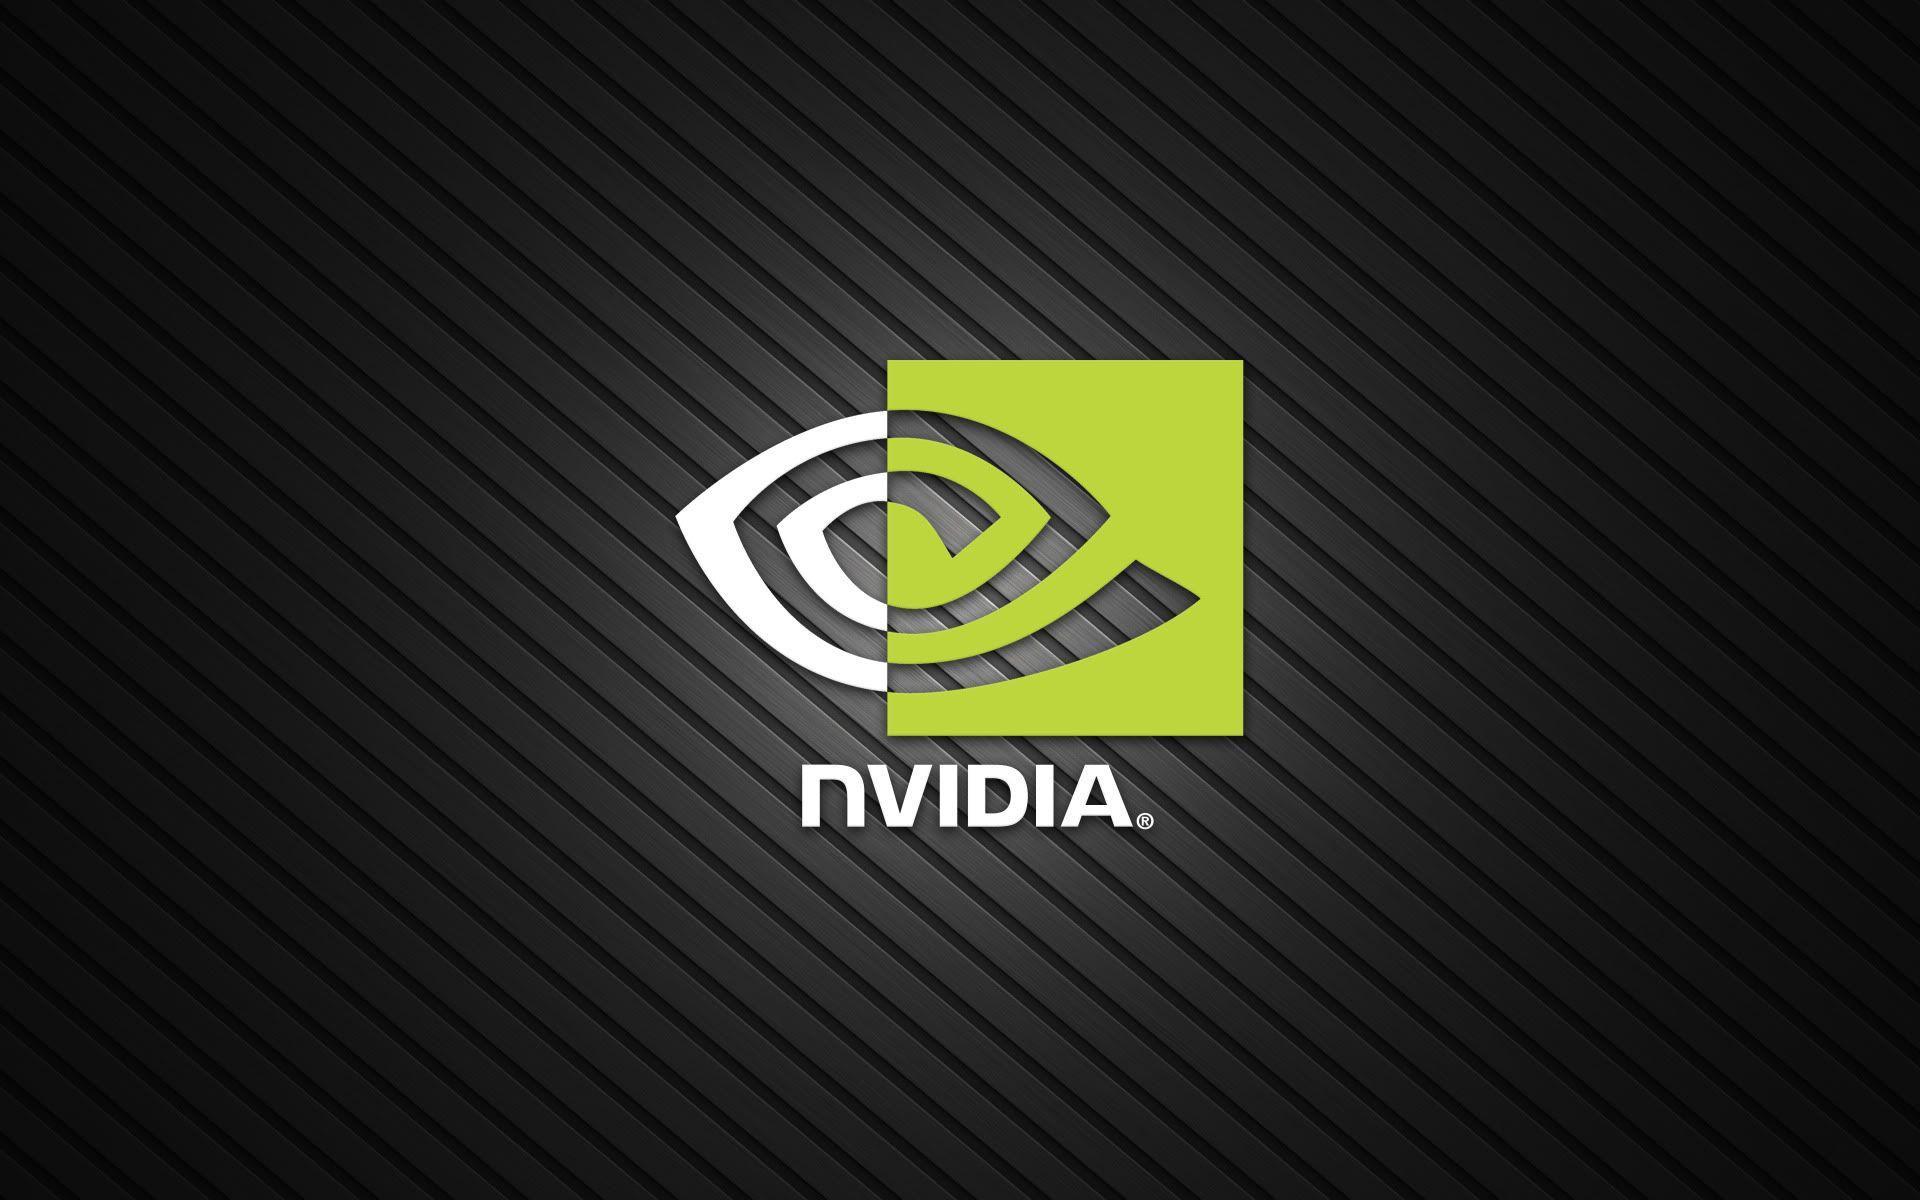 nvidia wallpaper 1600x900 - photo #7